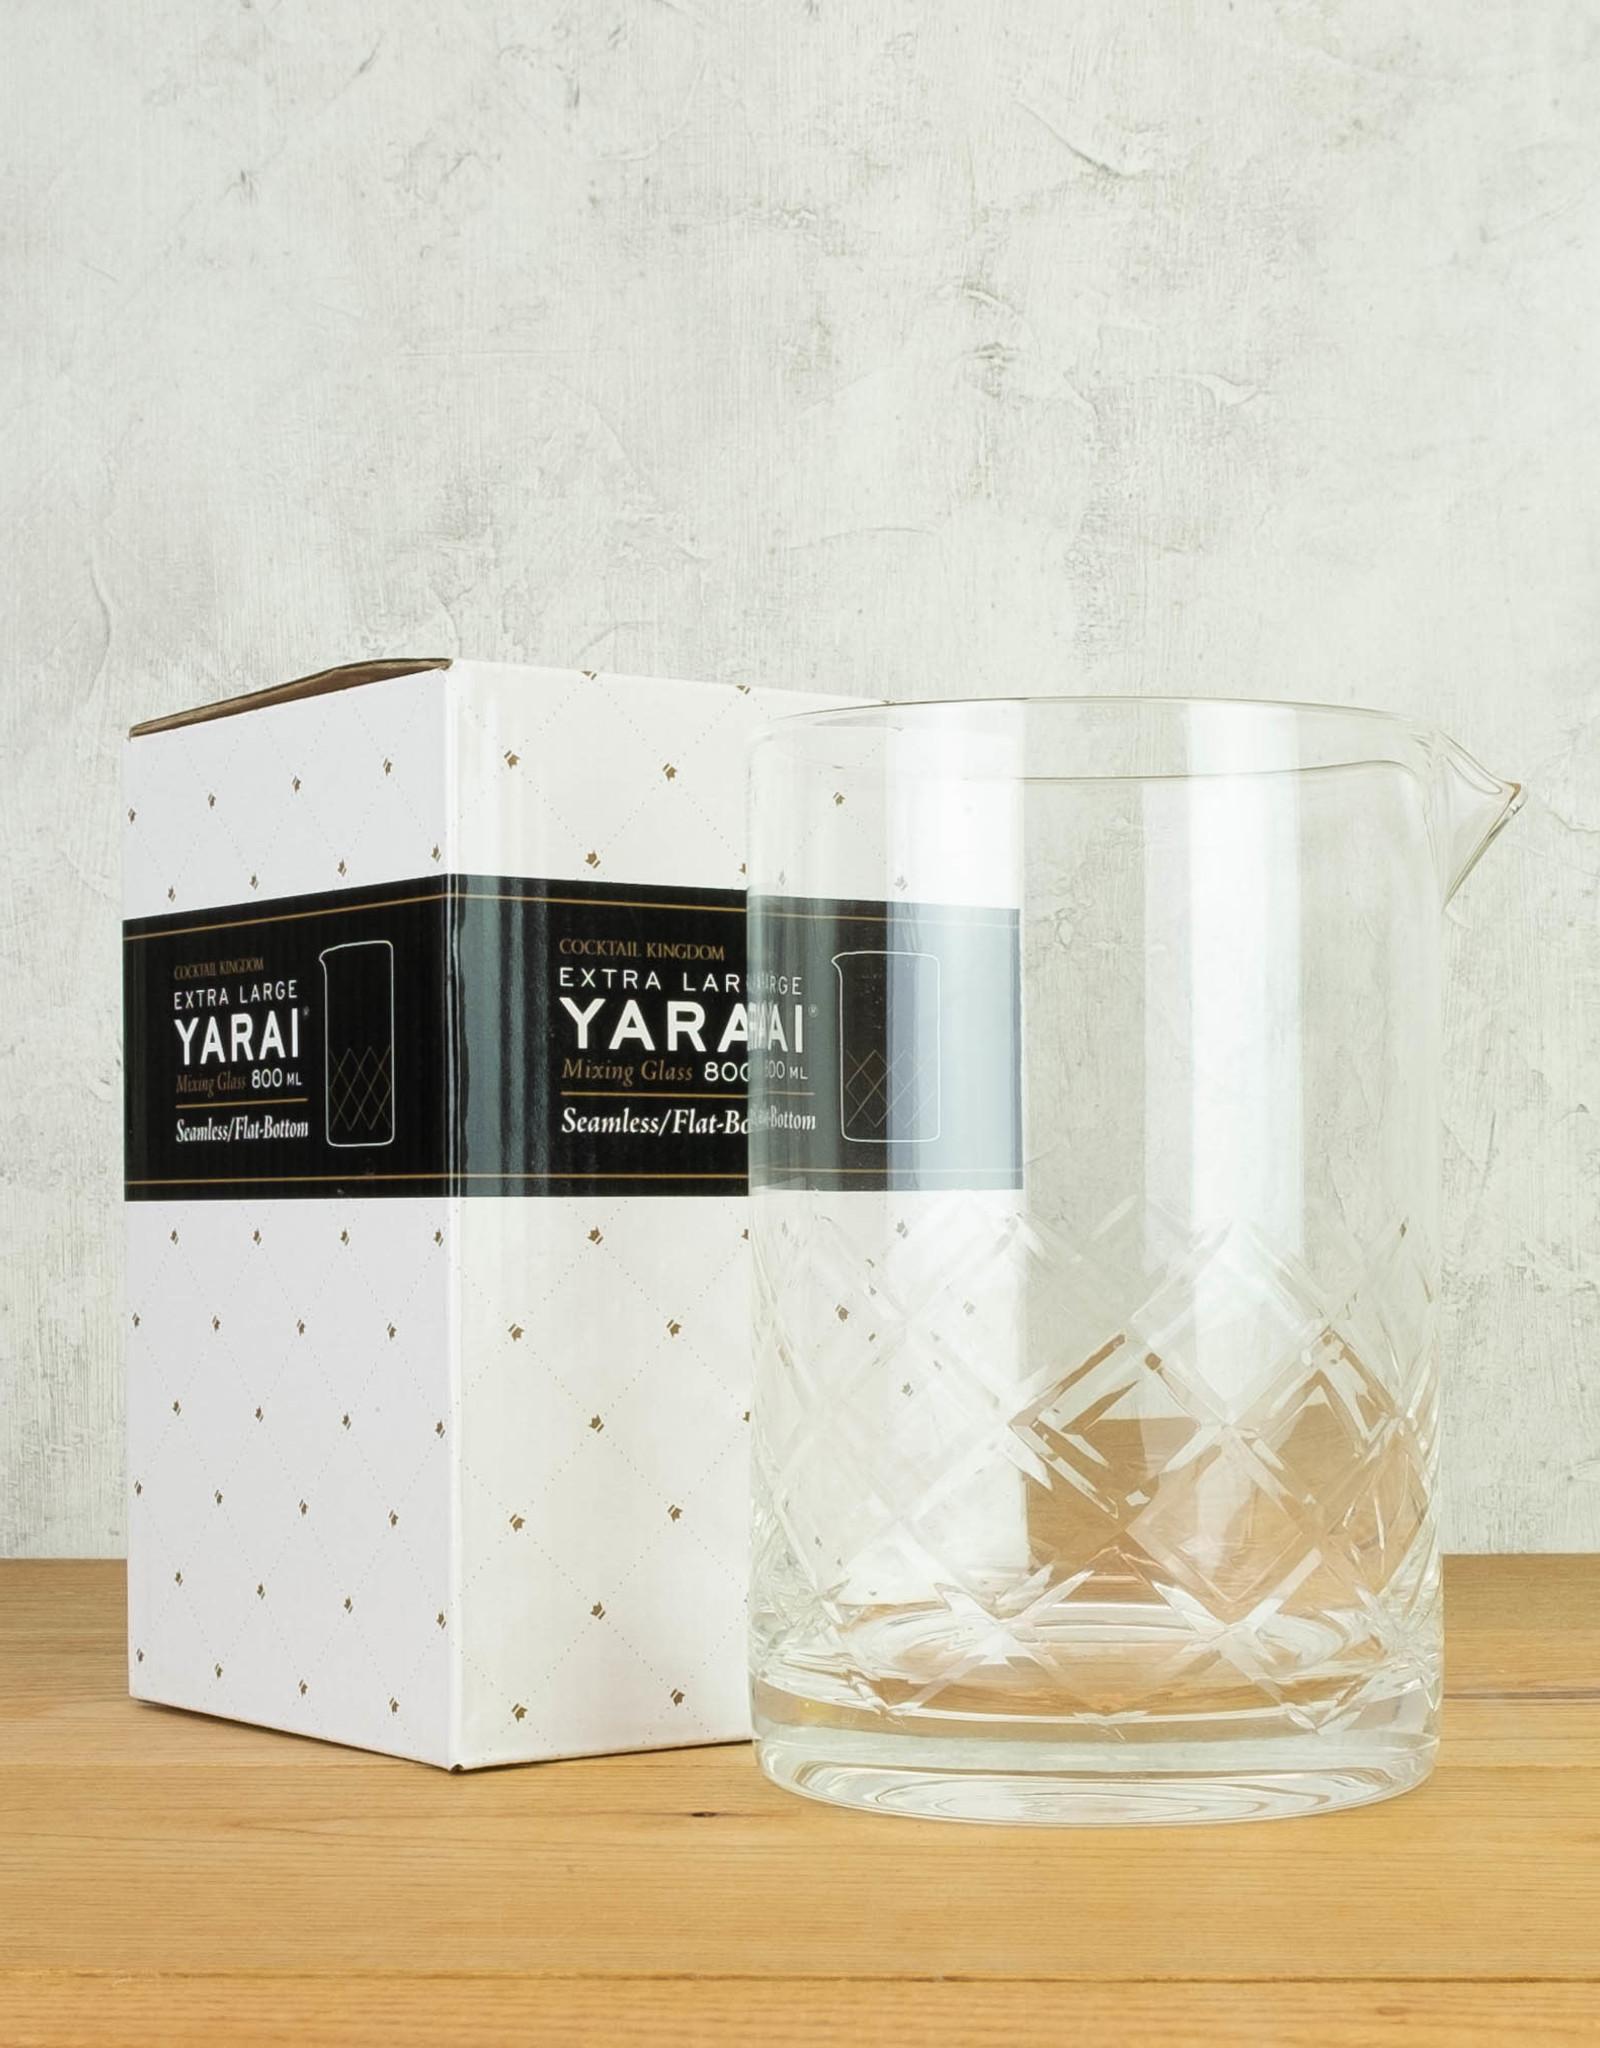 Yarai  Mixing Glass 800ml